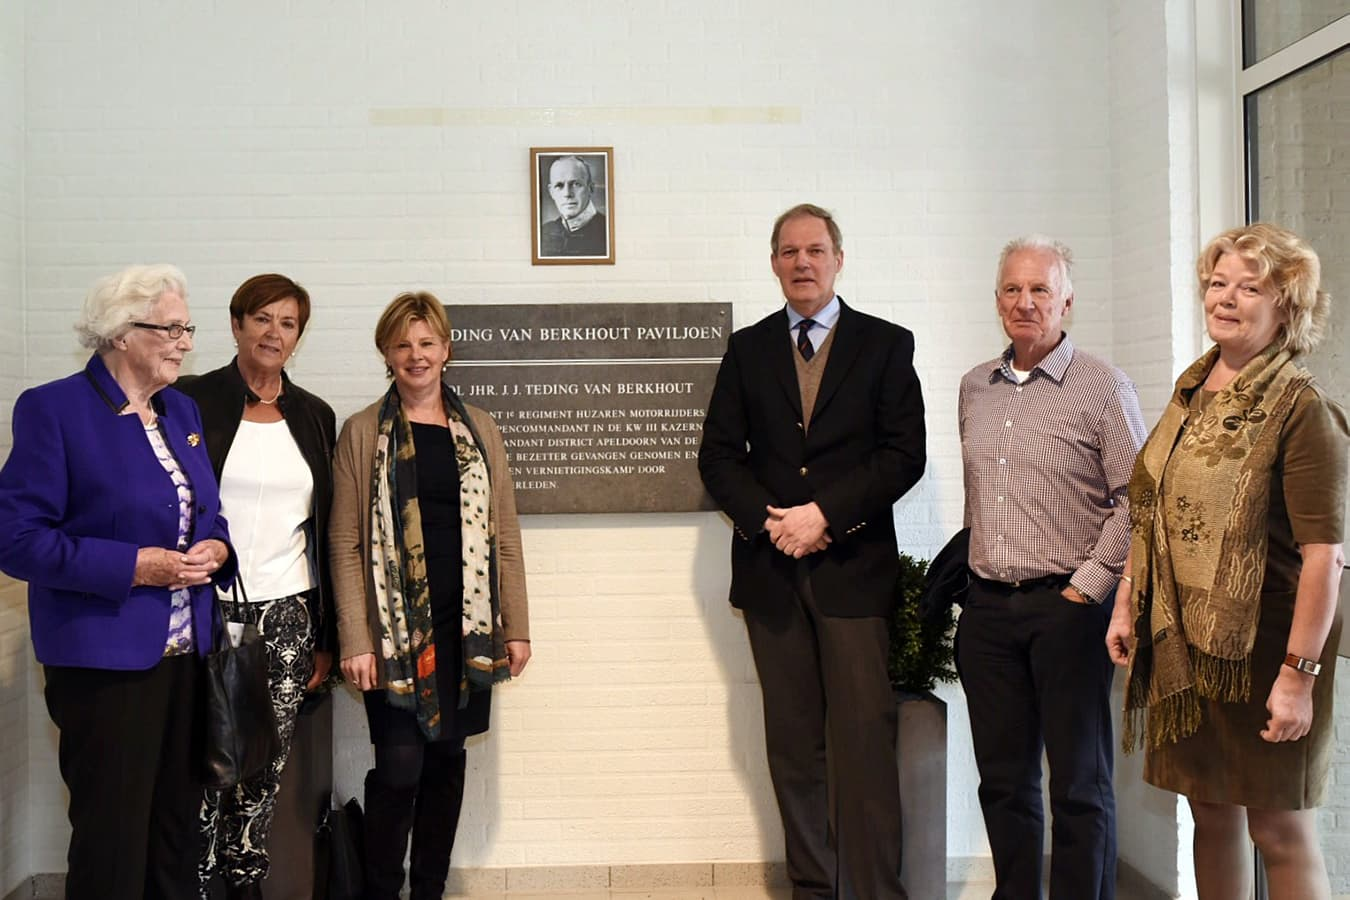 2e onthulling plaquette 26 april 2016 familieleden Teding van Berkhout